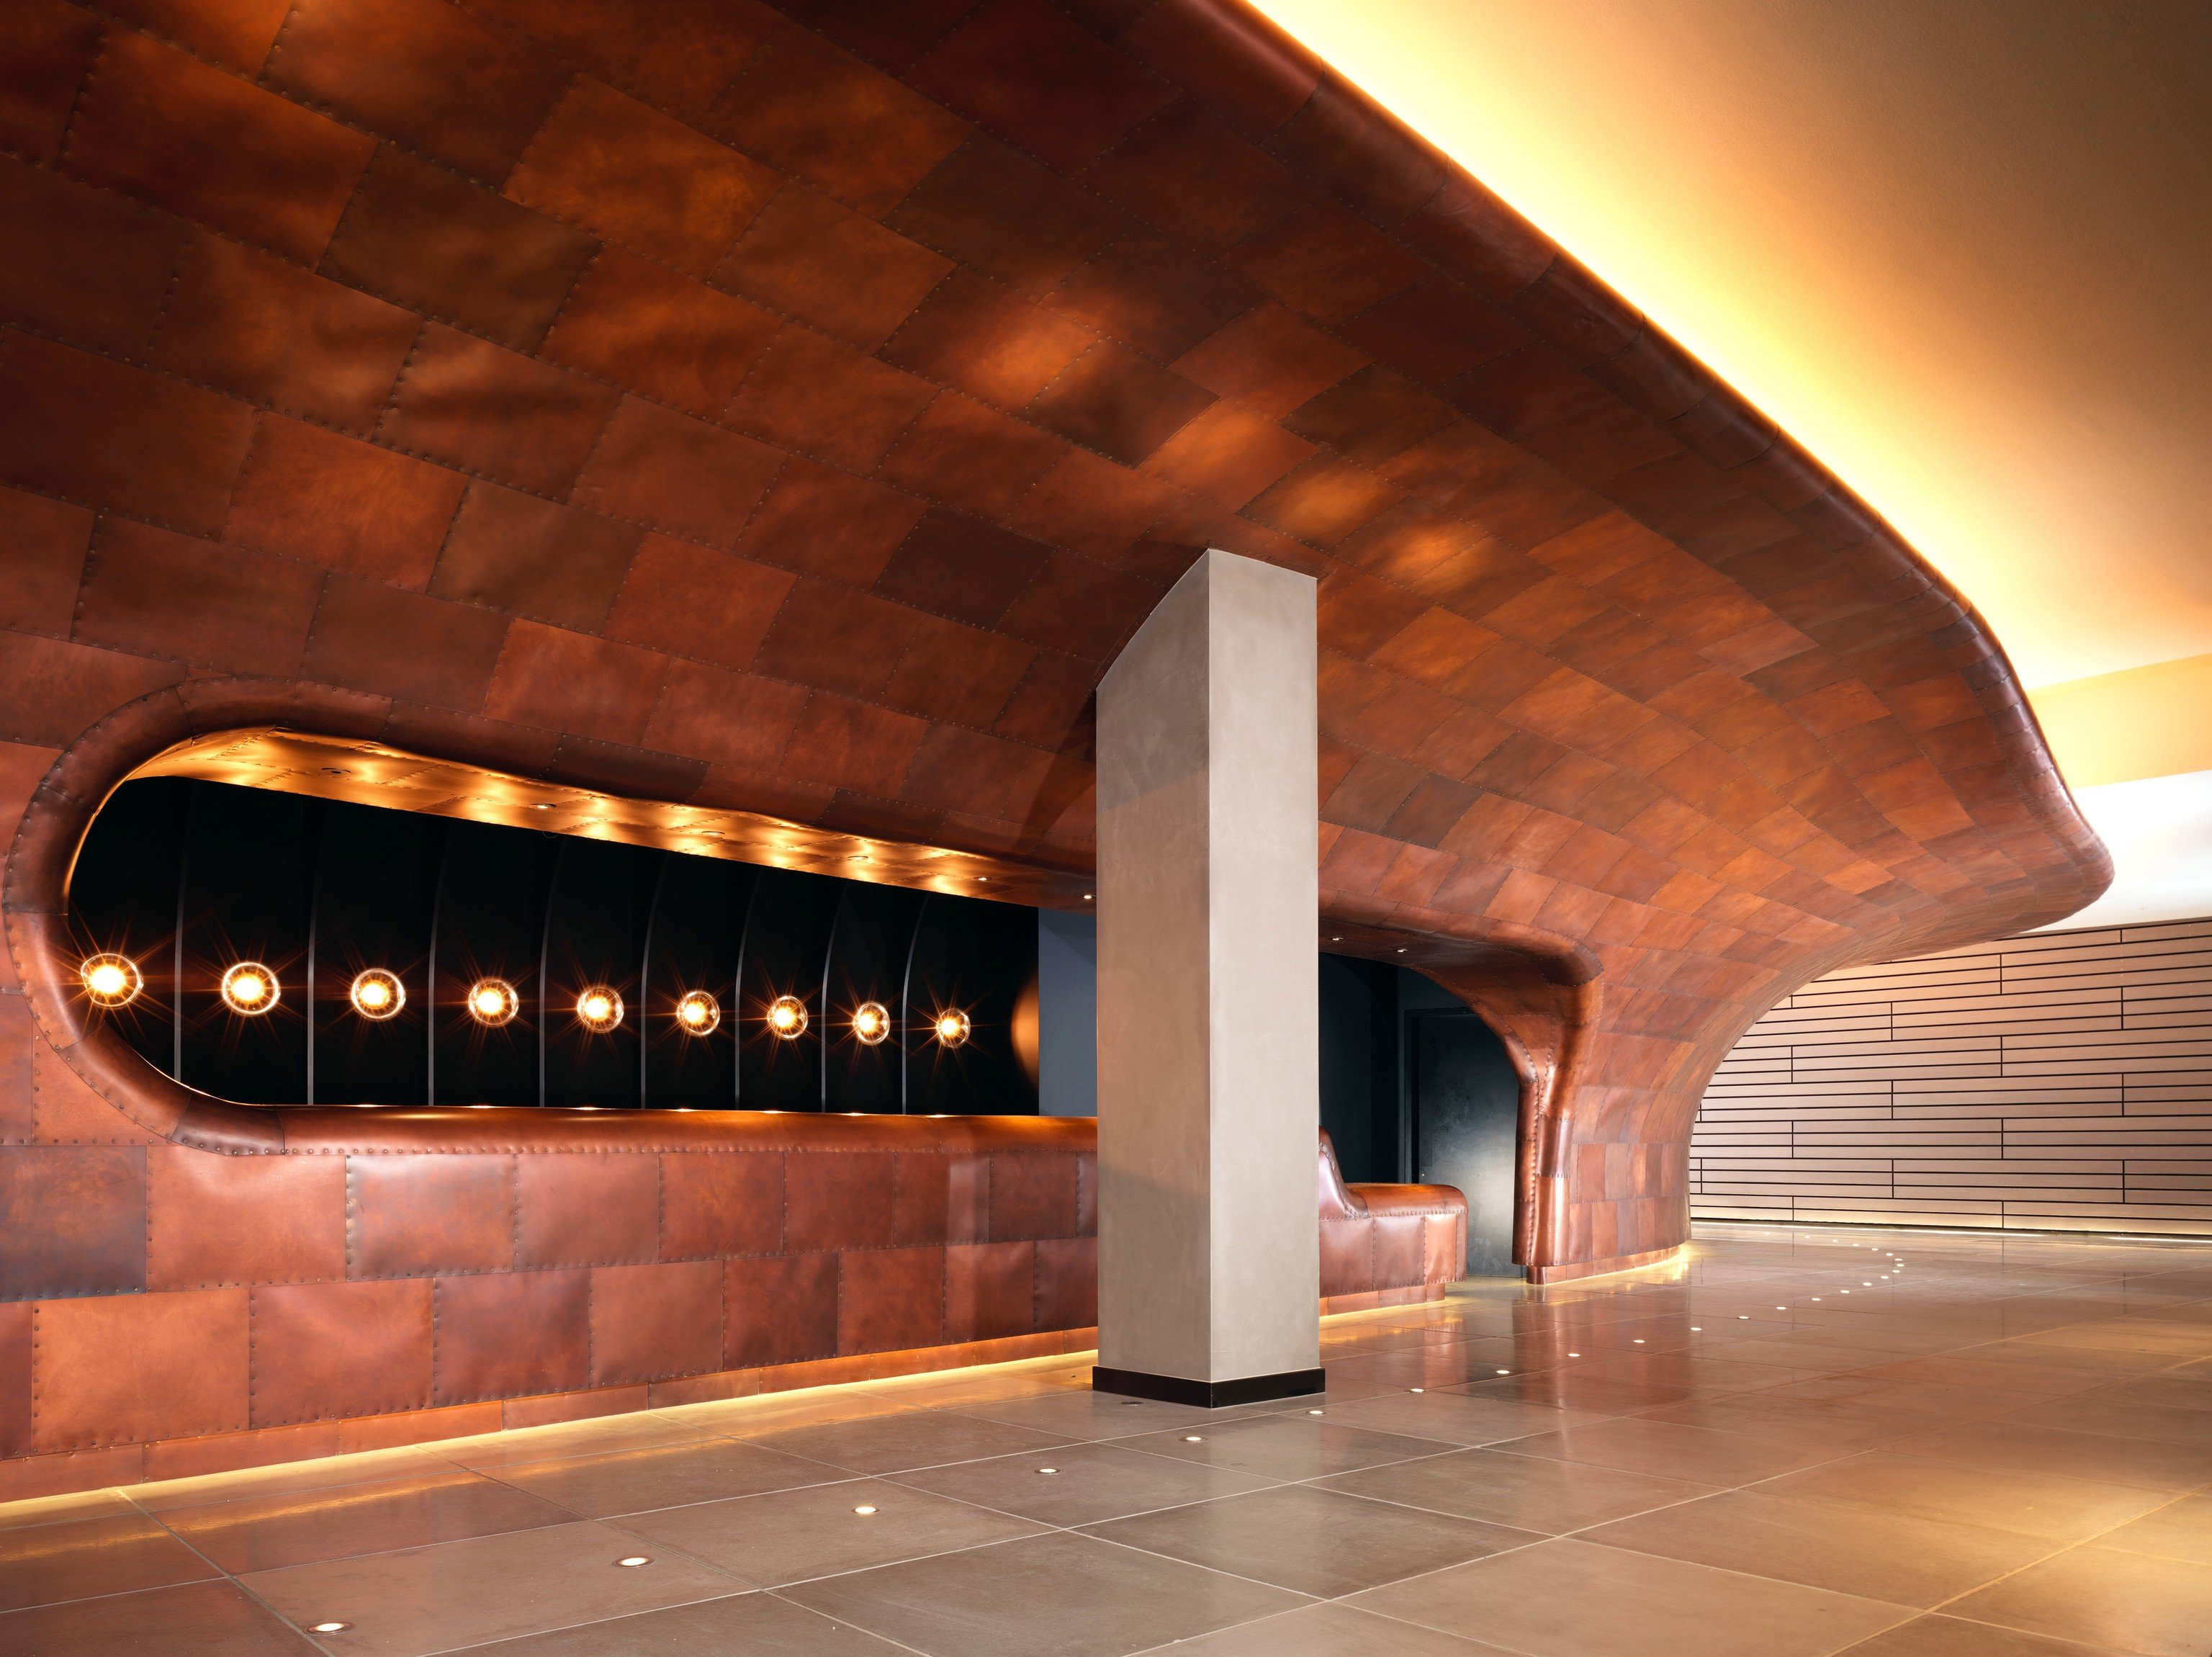 Hotels indoor Architecture night arch light subway public transport auditorium metro station